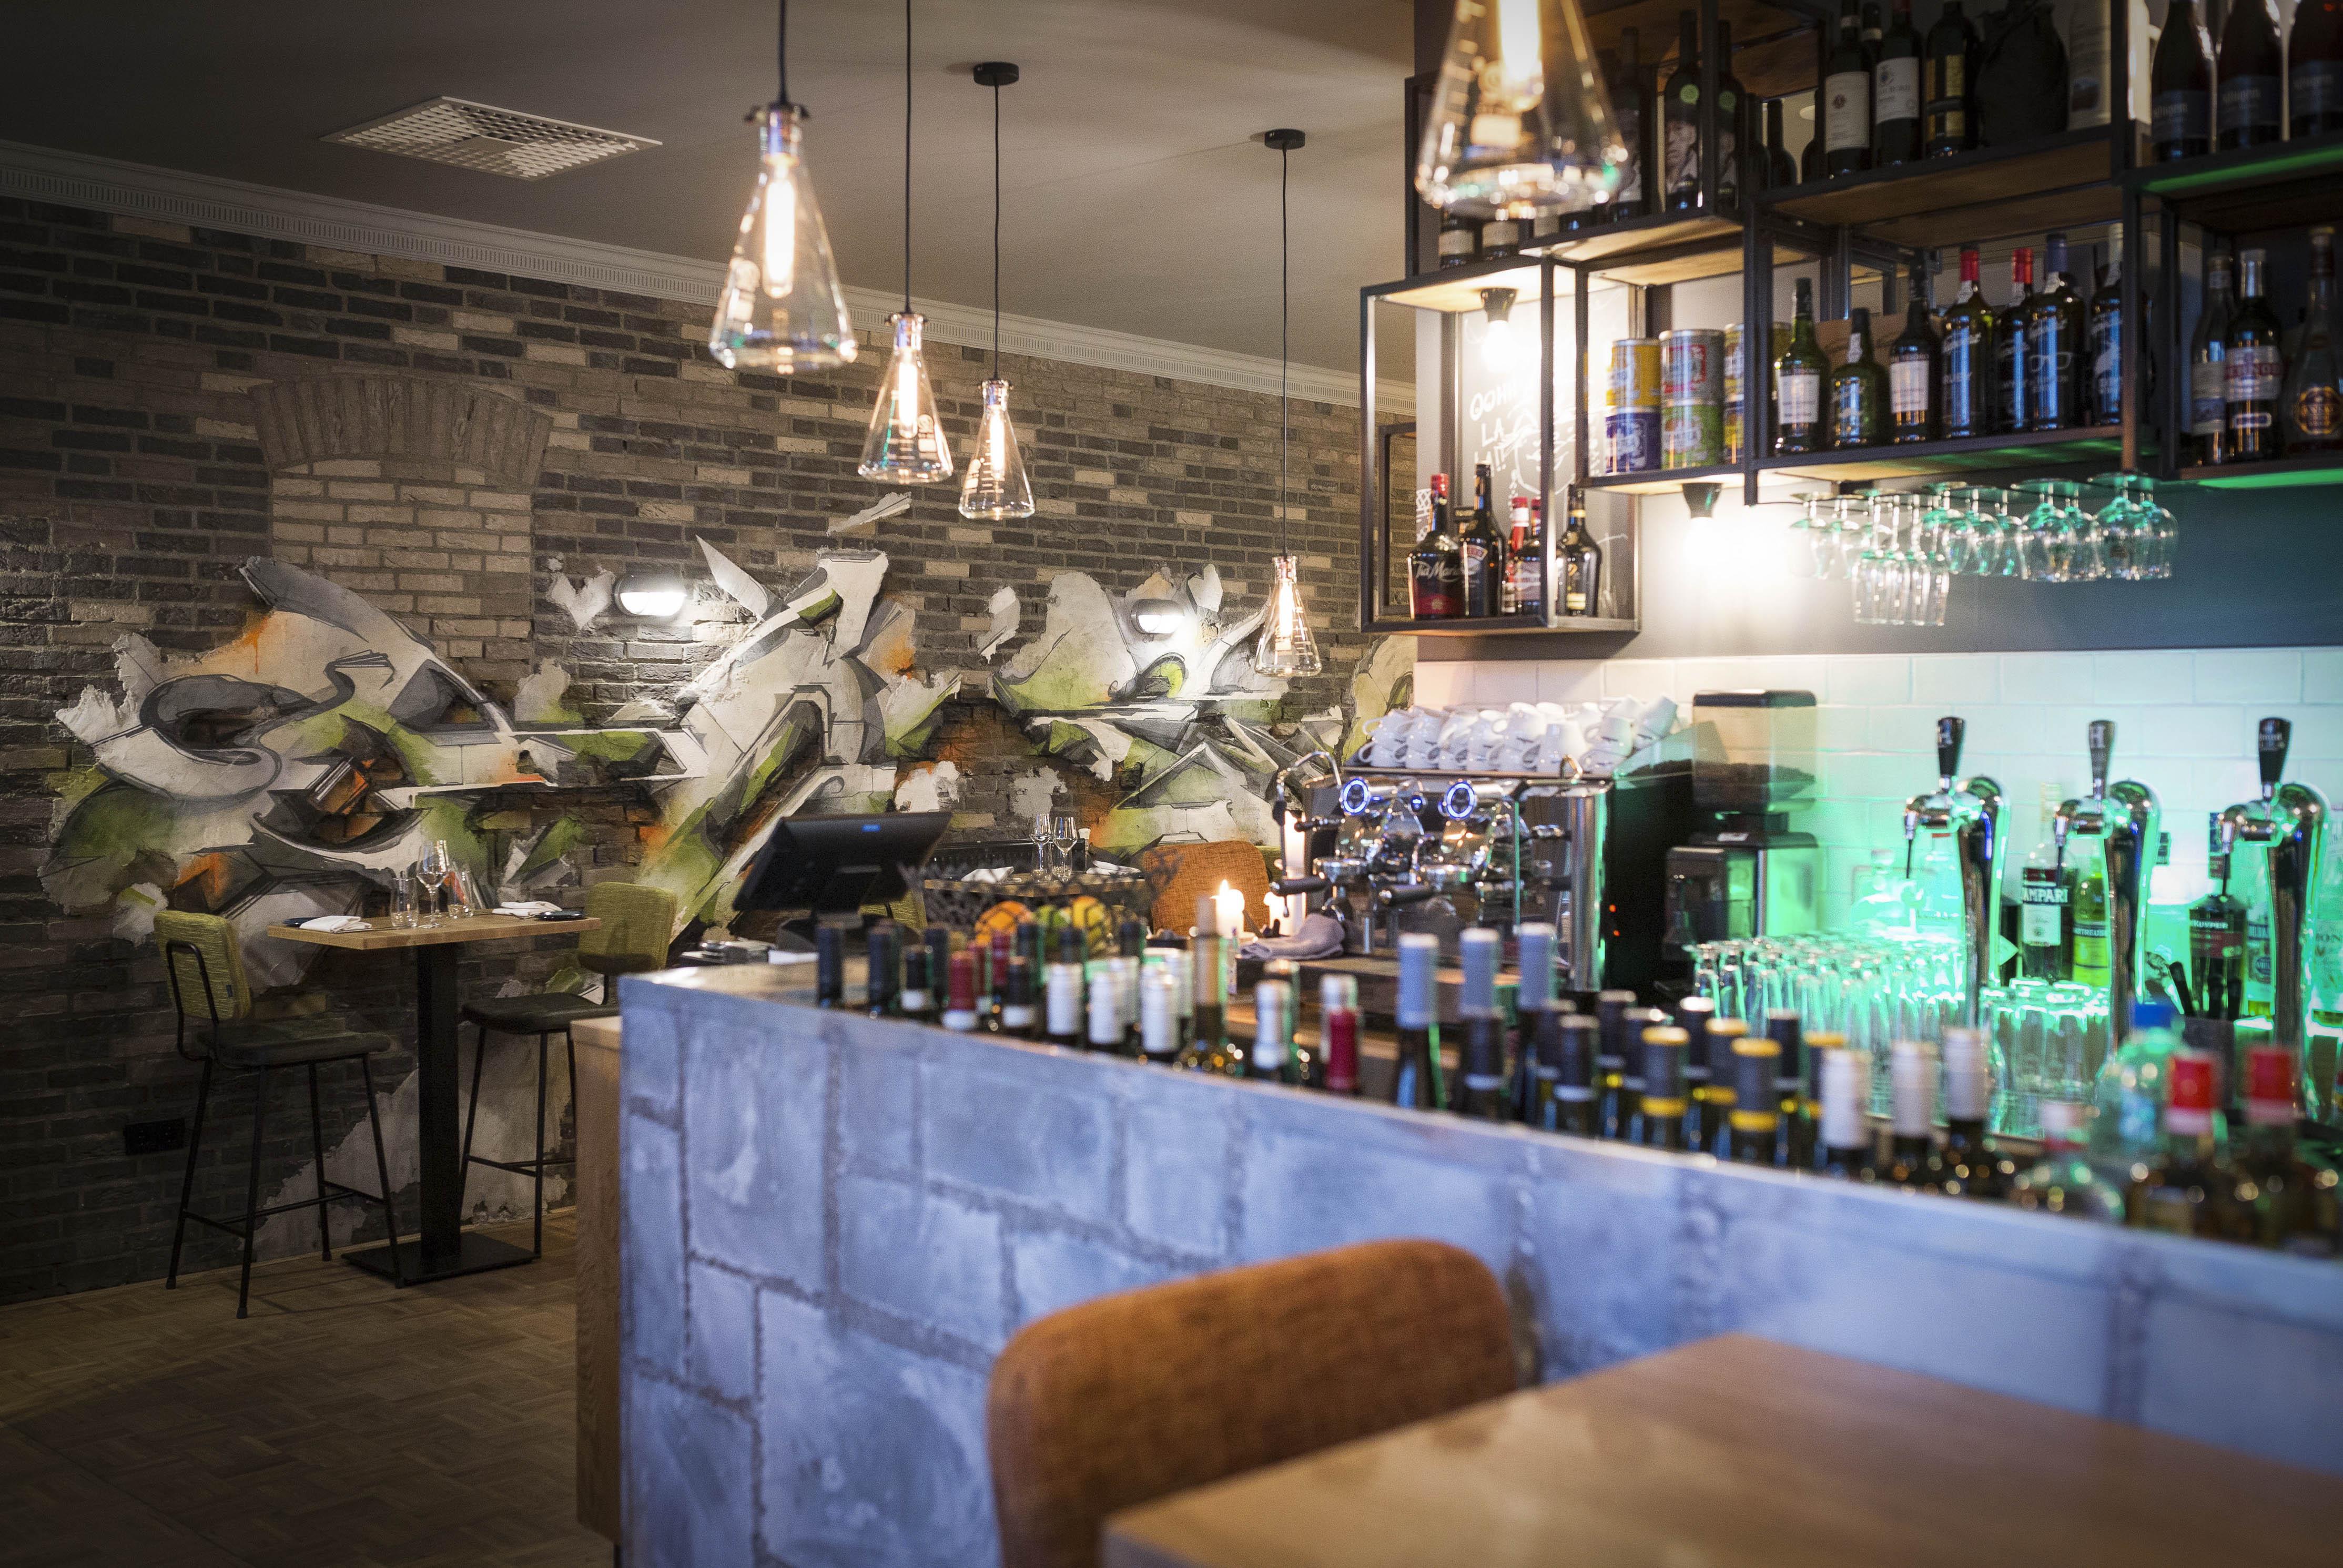 A work by Does - 3 Digital Does Zinc Restaurant_Blickfänger10-smaller